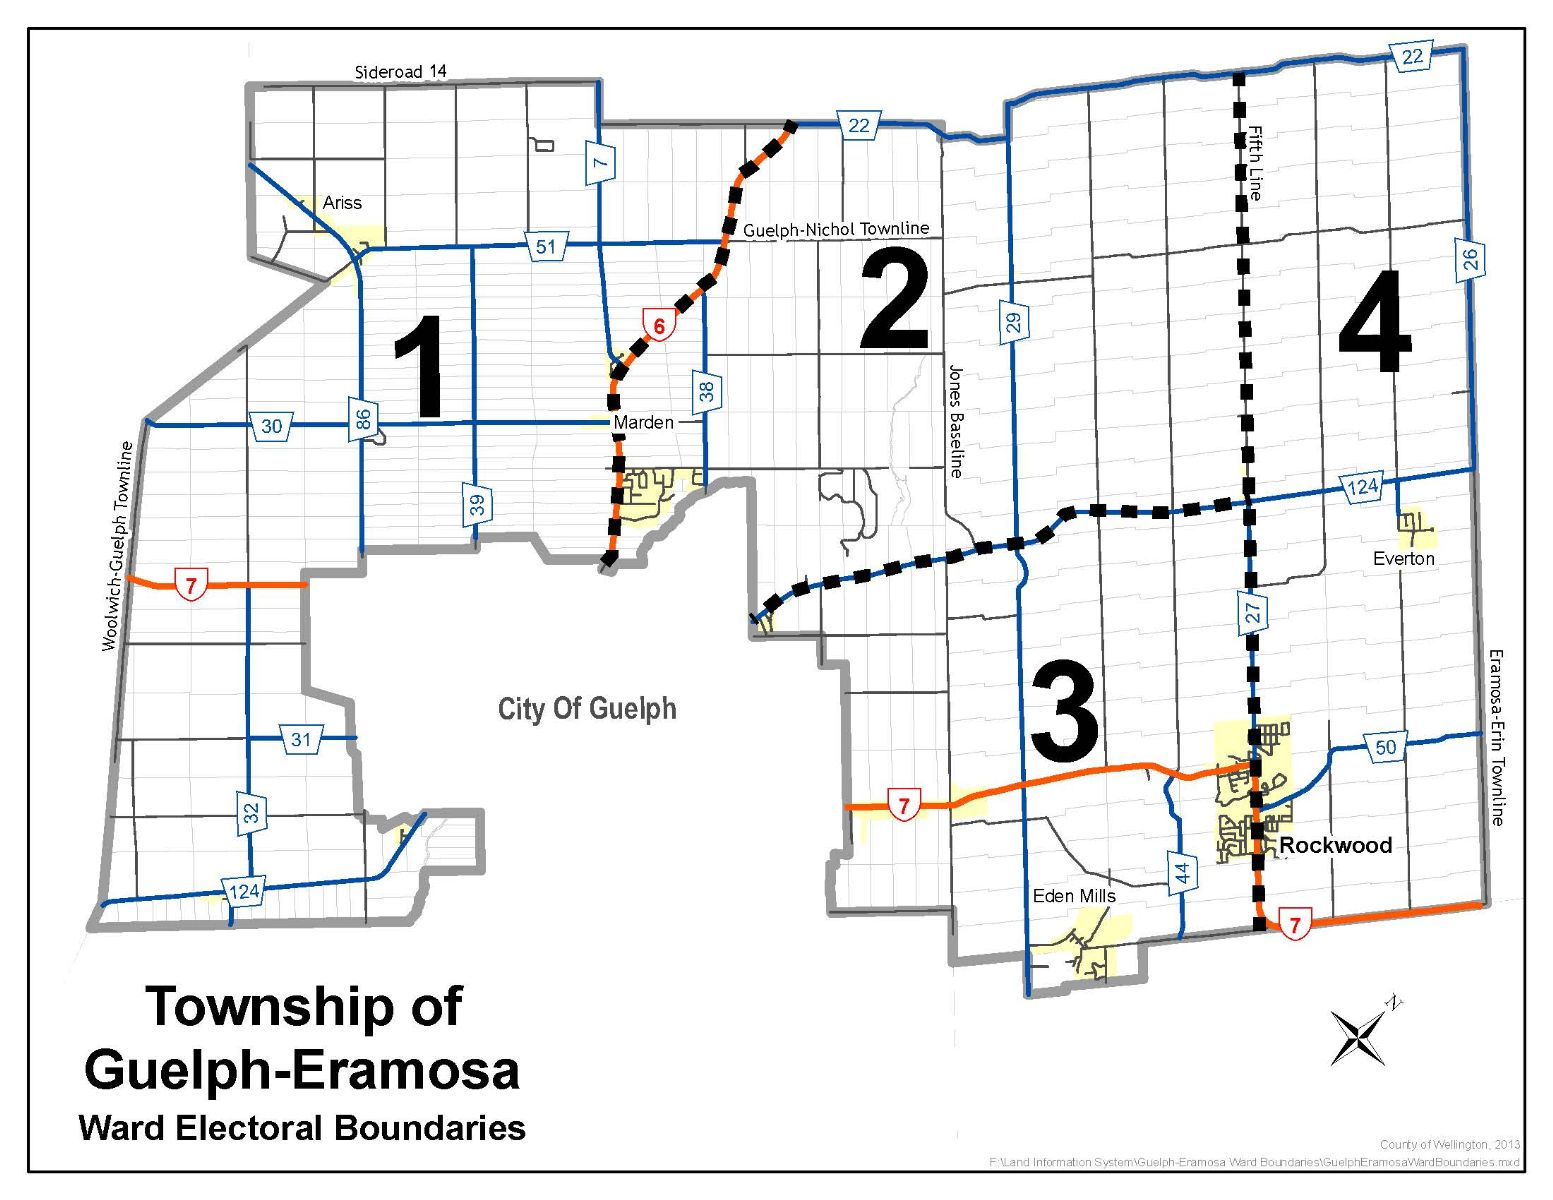 Guelph/Eramosa Township Ward Map